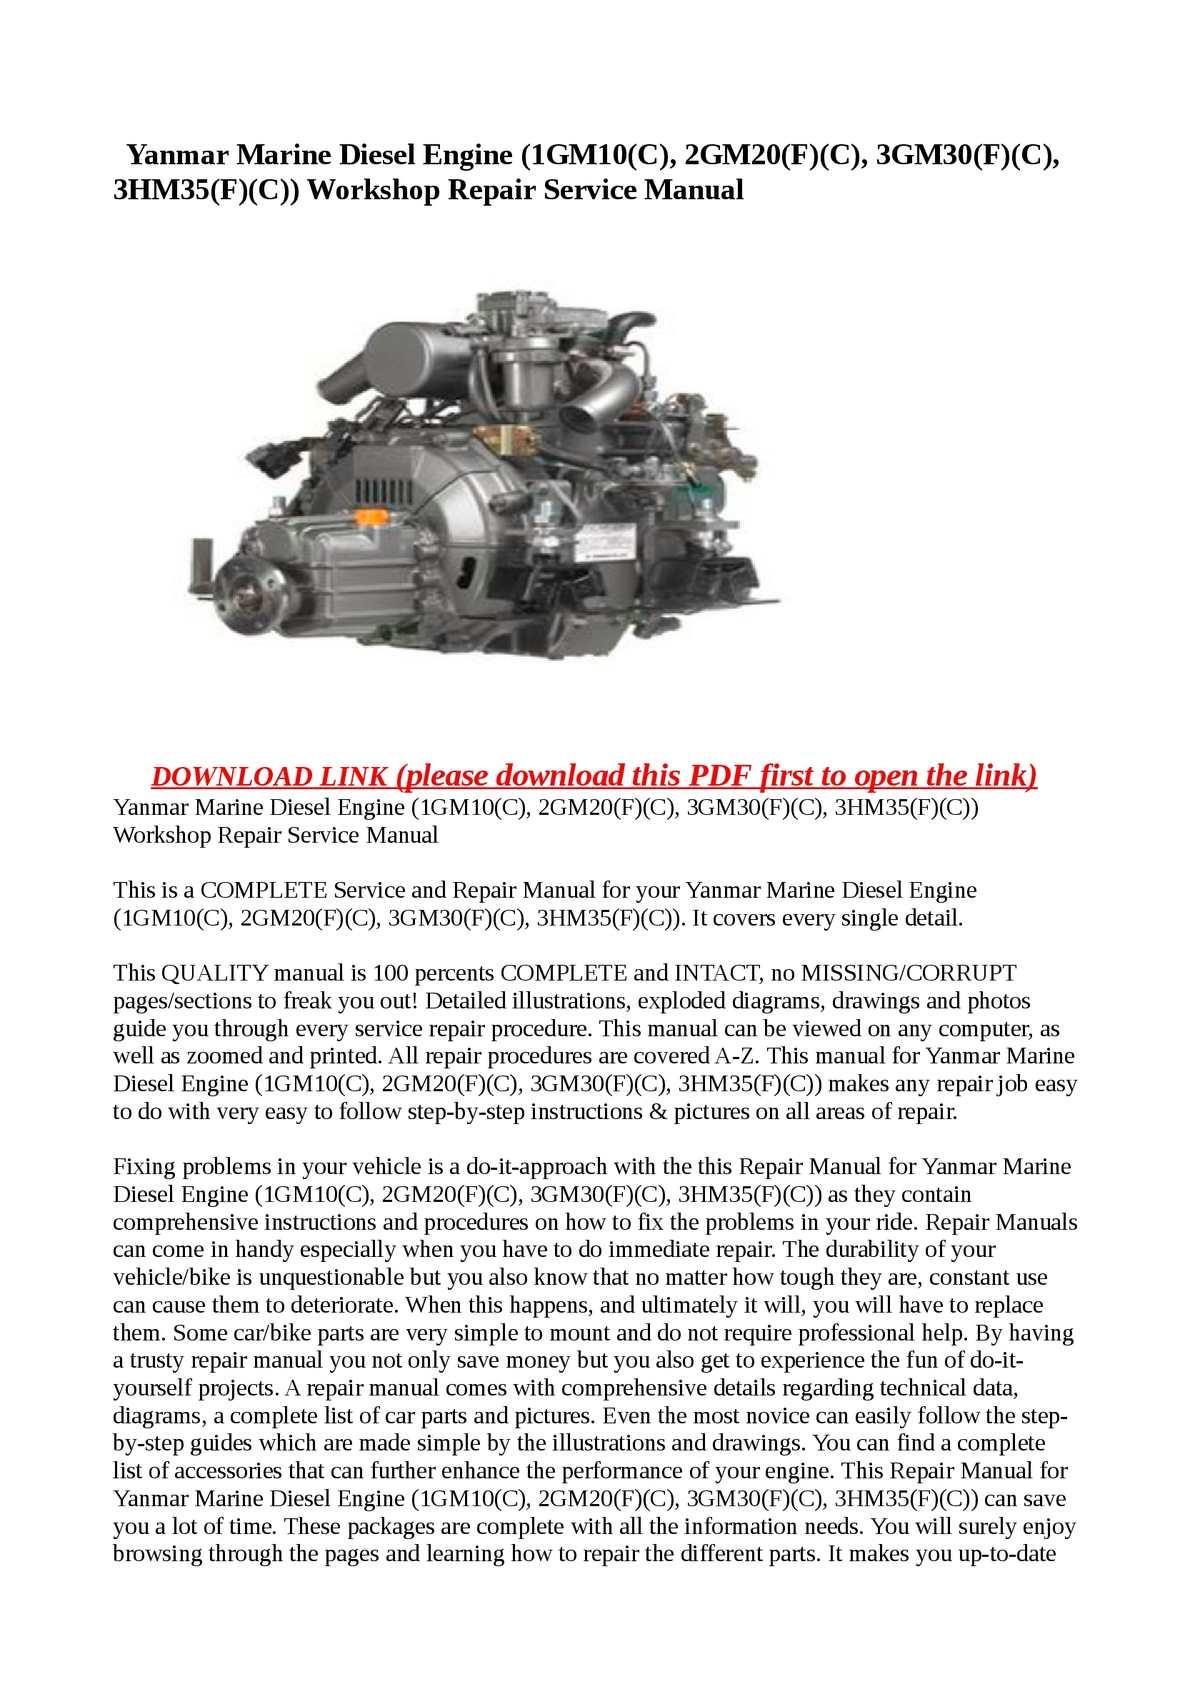 Calaméo - Yanmar Marine Diesel Engine (1GM10(C), 2GM20(F)(C), 3GM30(F)(C),  3HM35(F)(C)) Workshop Repair Service Manual